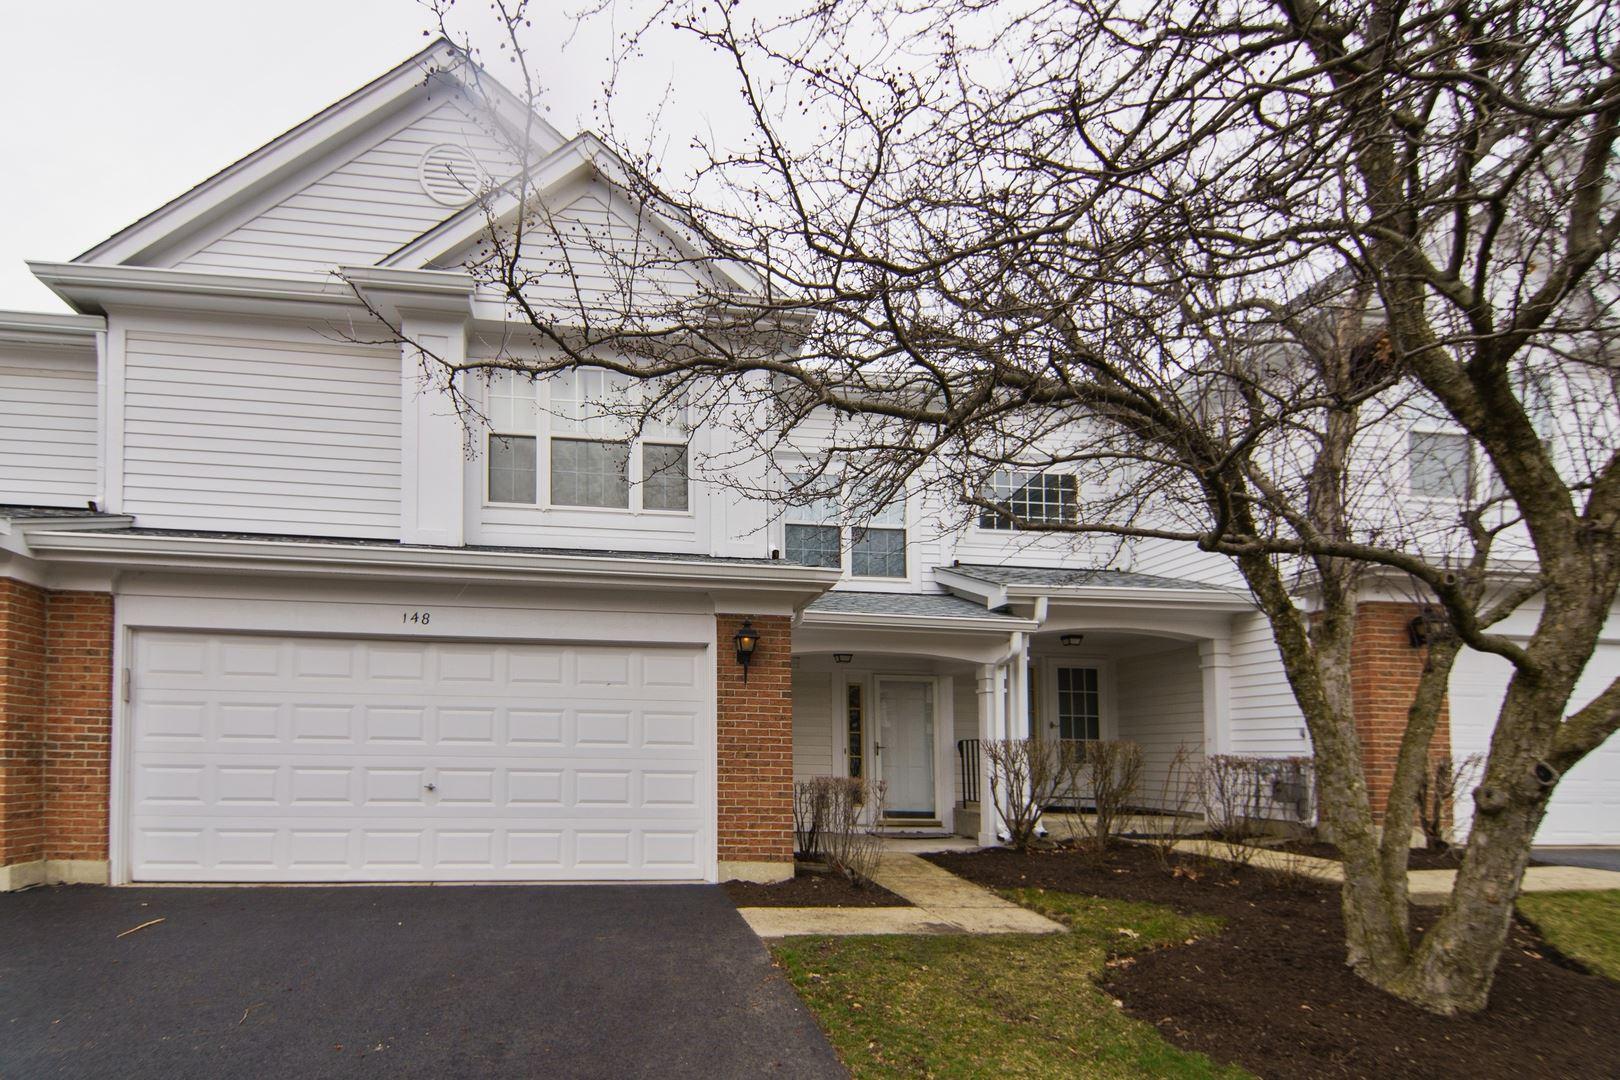 Photo for 148 Crescent Lane, Schaumburg, IL 60193 (MLS # 10670686)